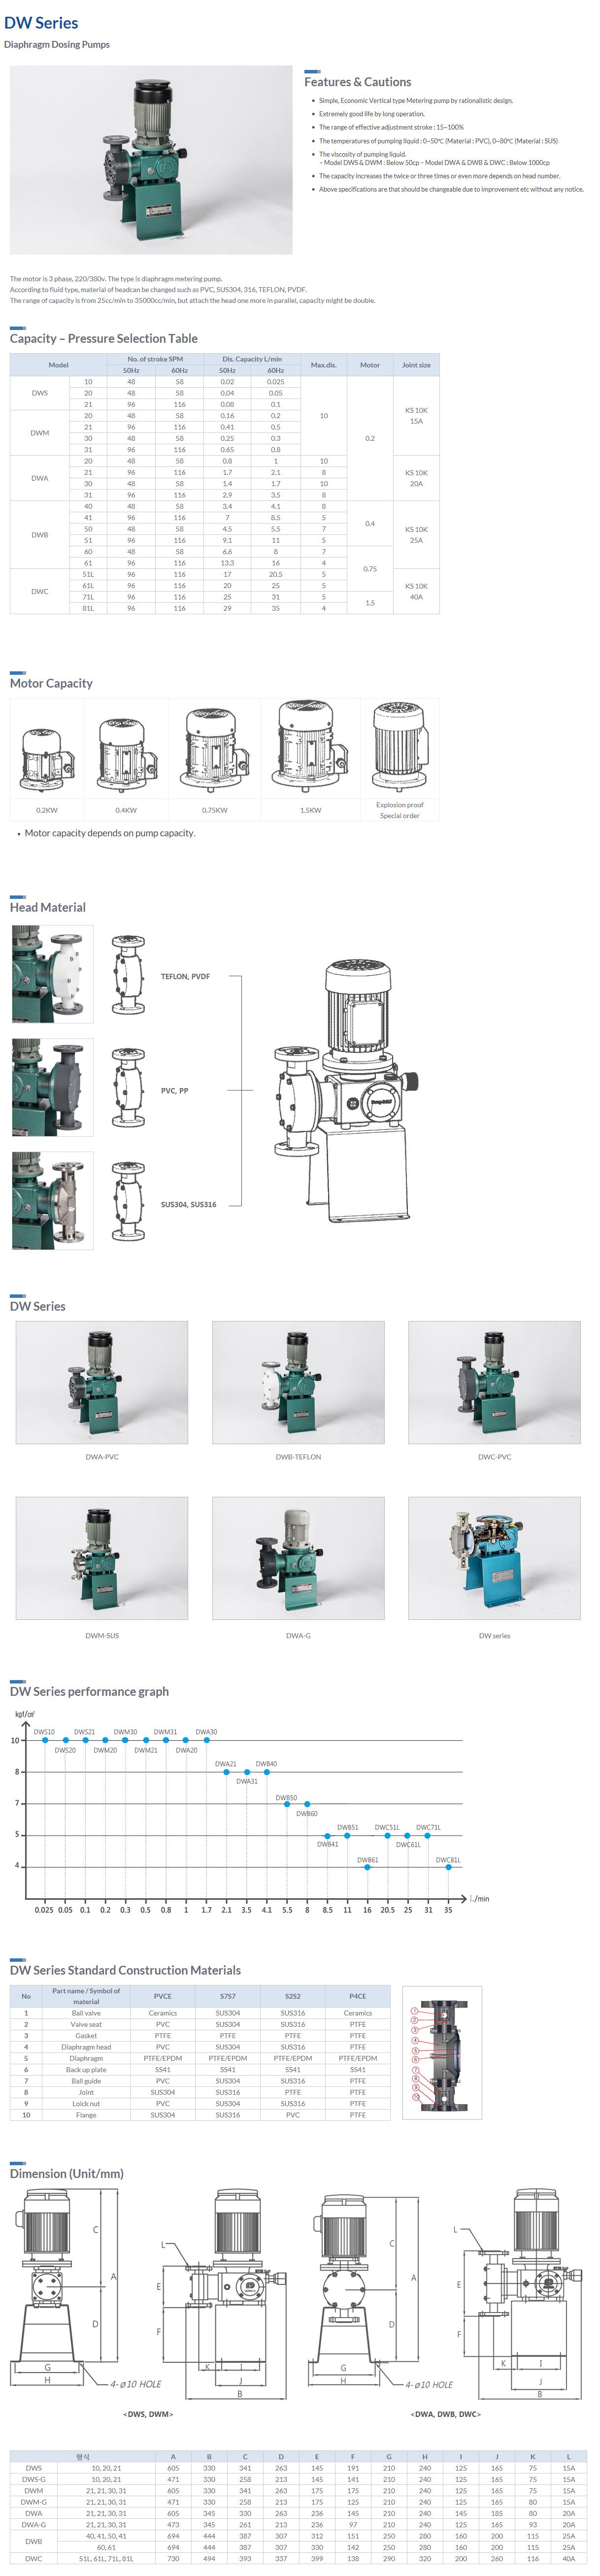 DONG-IL MT Diaphragm Dosing Pumps DW Series